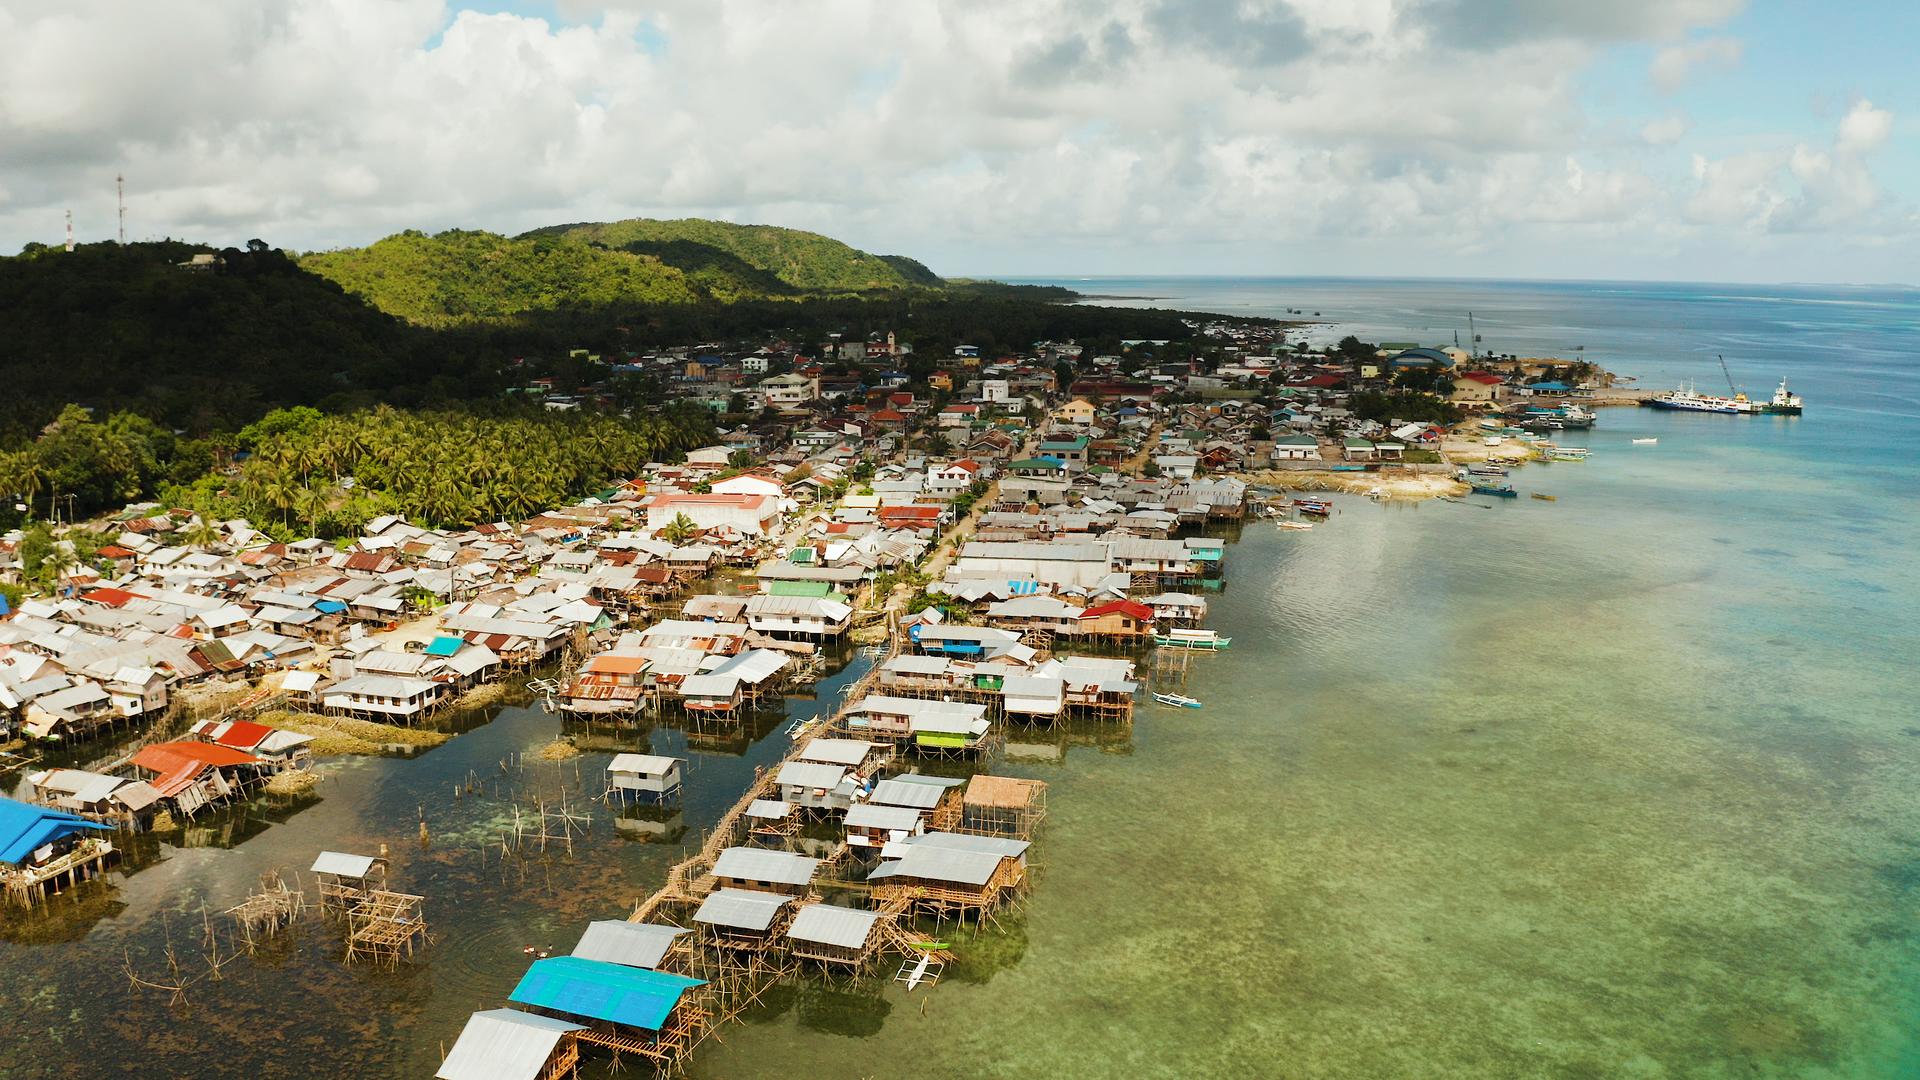 Sailing Through Dapa in the Philippines